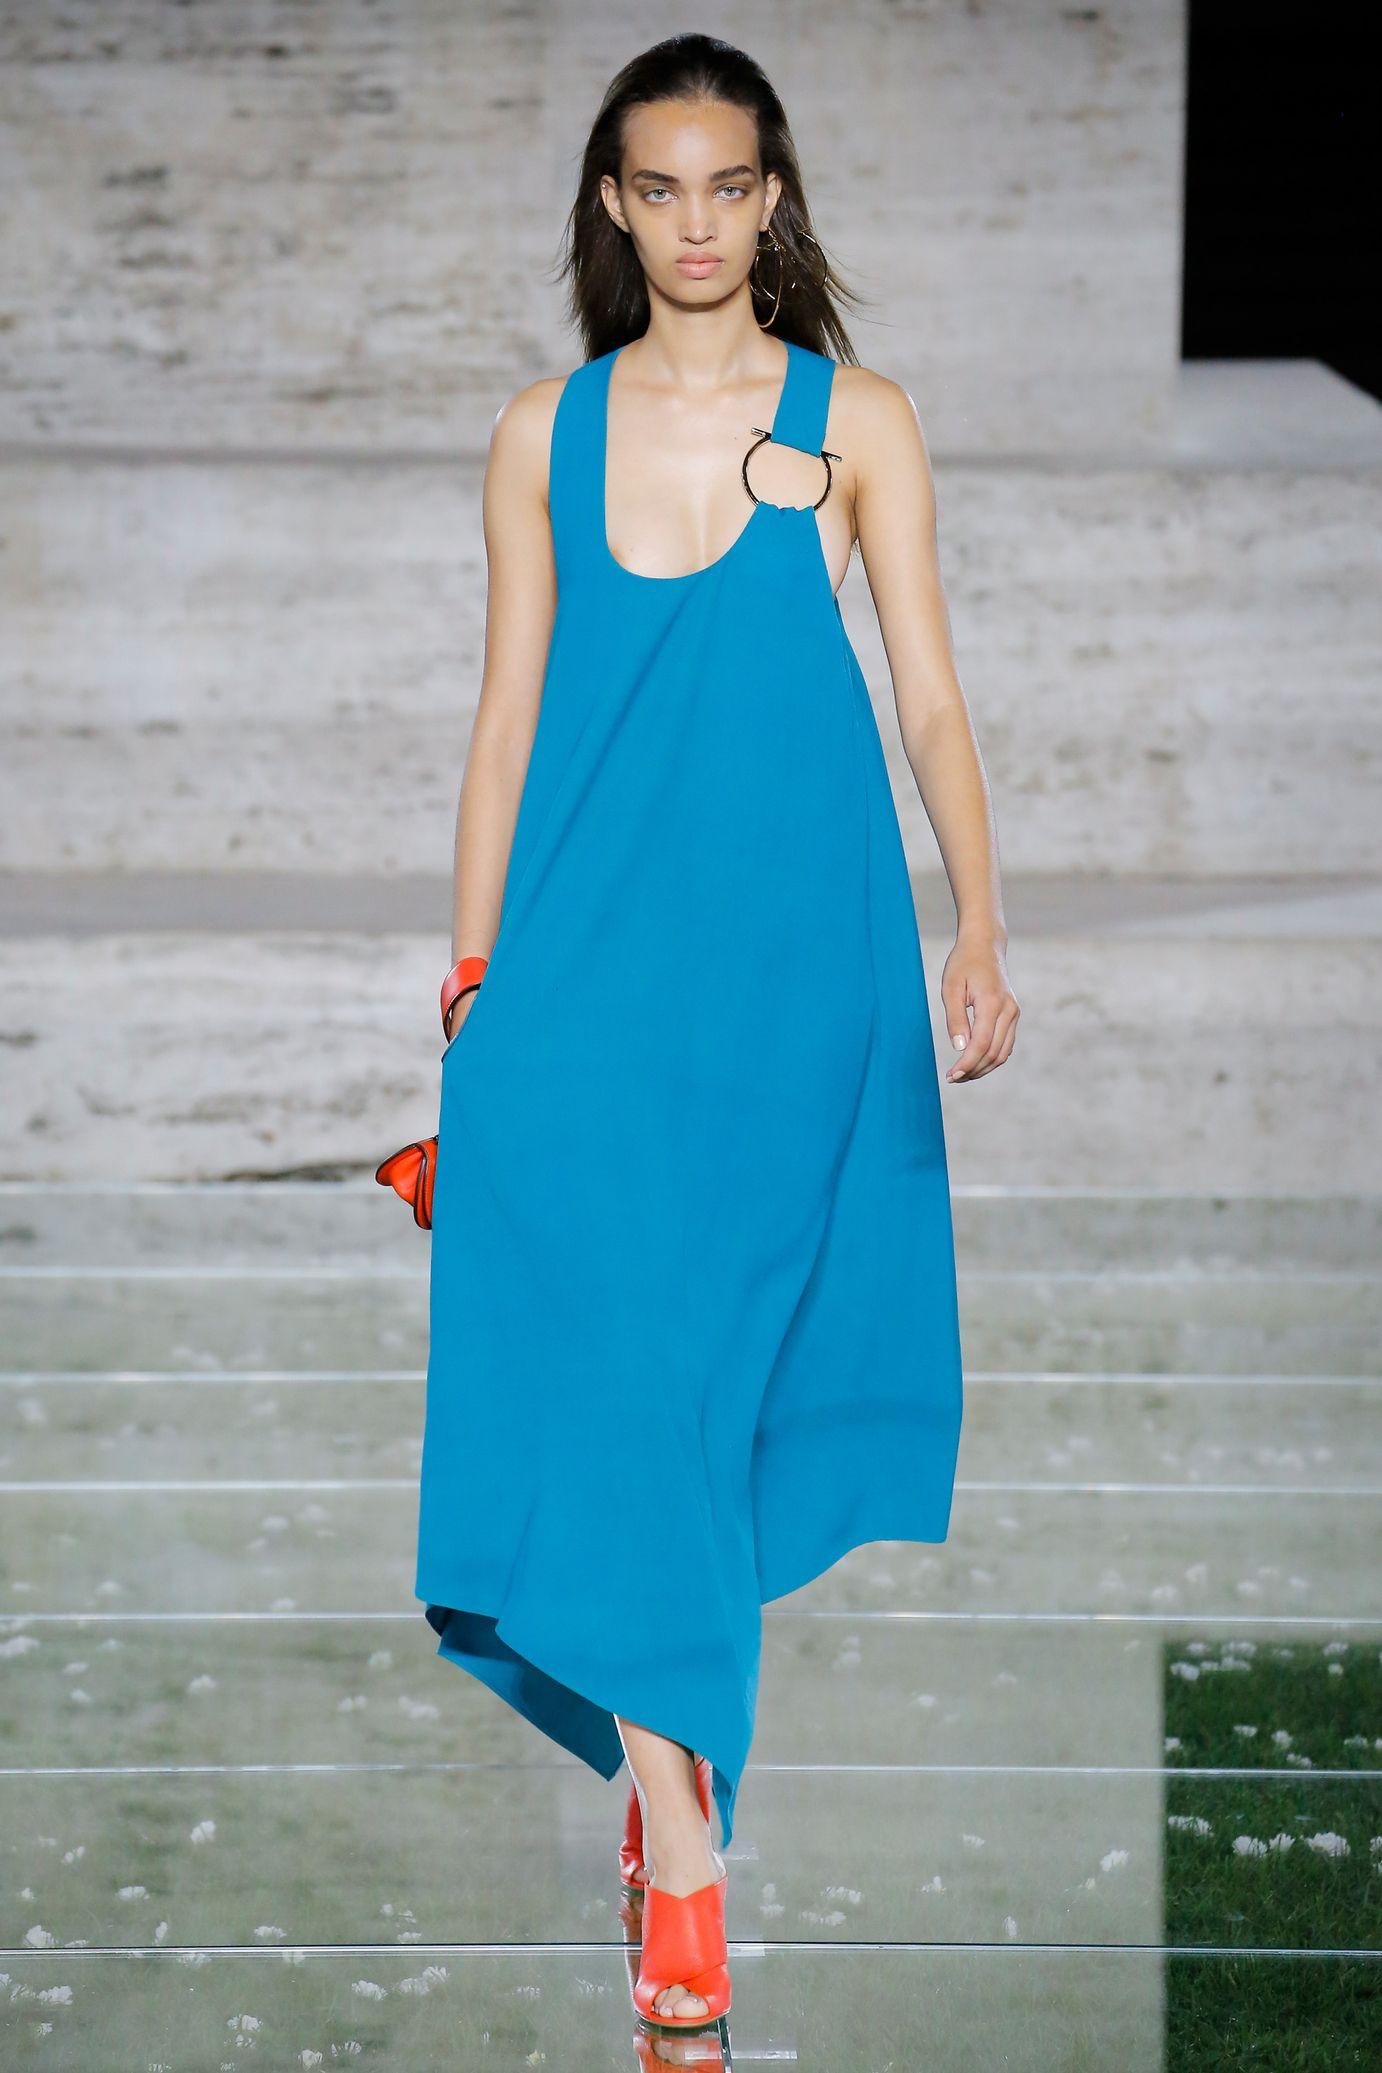 Salvatore Ferragamo весна лето 2018 синее платье